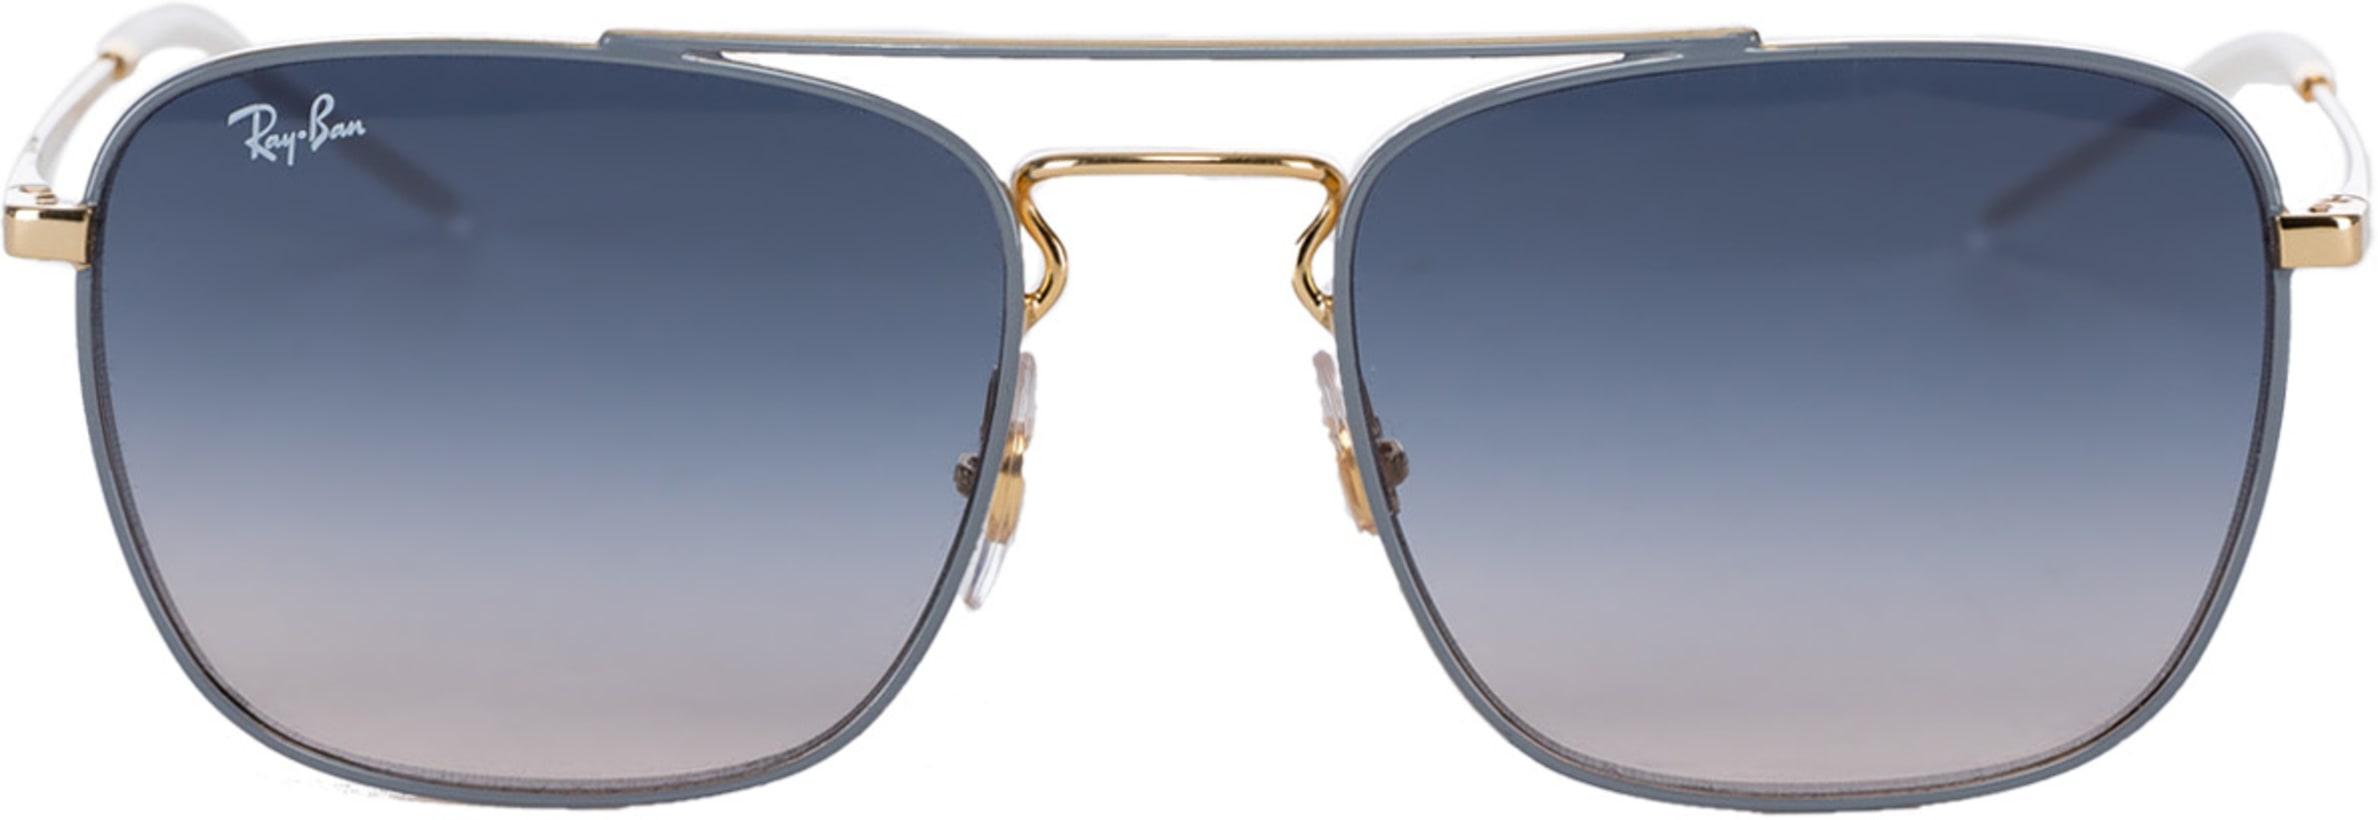 0442777b5d50 Ray-Ban: Square Gradient Sunglasses - Light Grey Gold/Blue Gradient ...